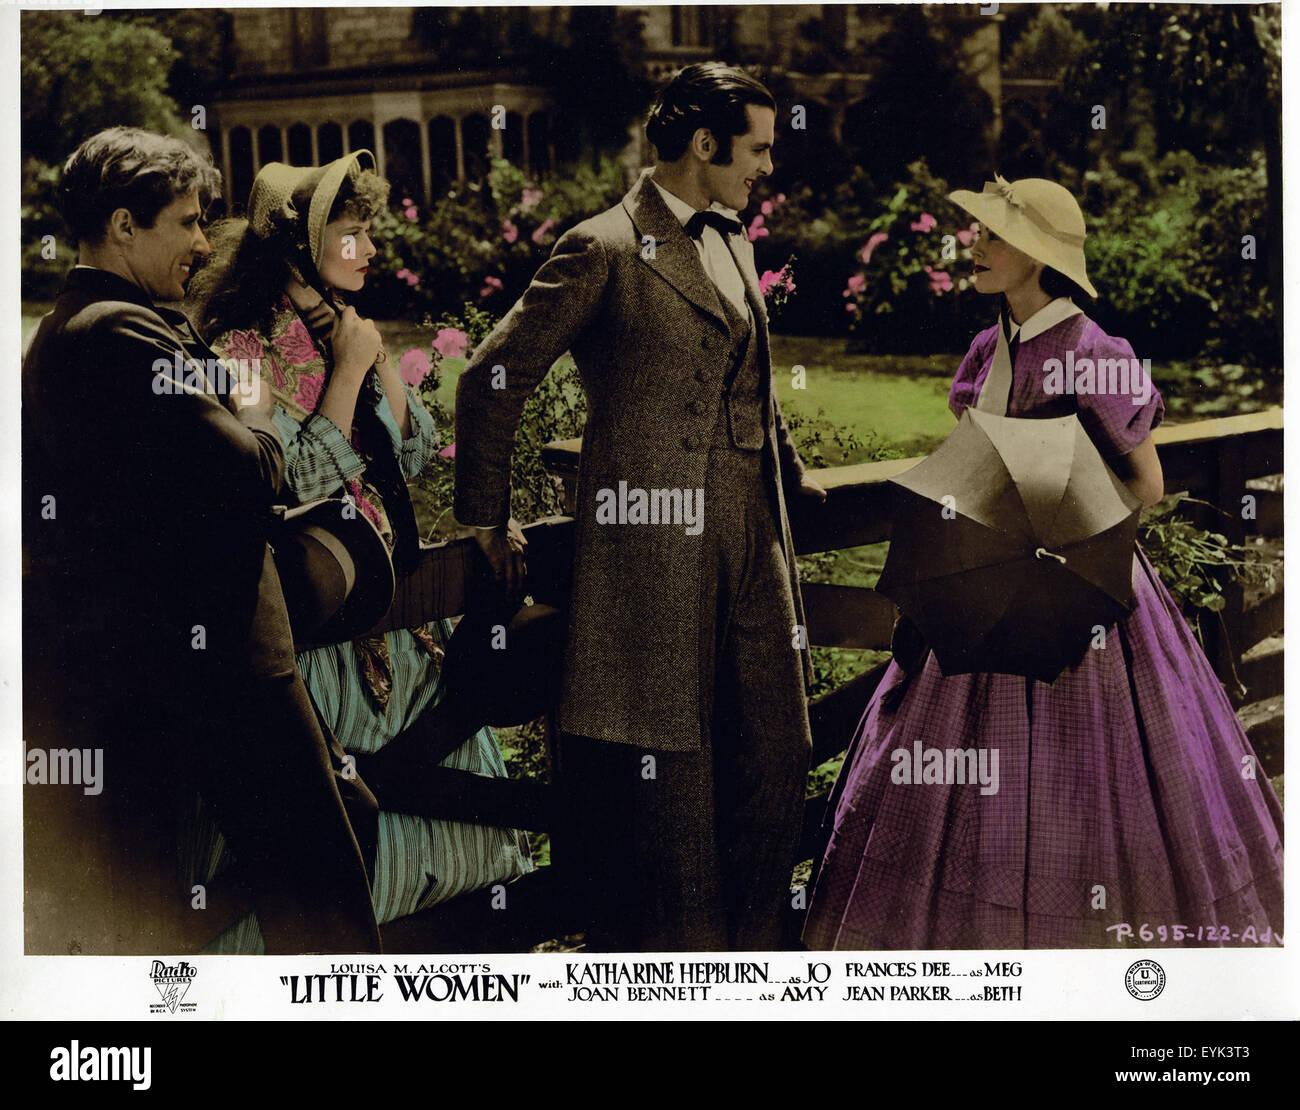 Little Women - Katharine Hepburn - 1933 - Movie Poster - Stock Image